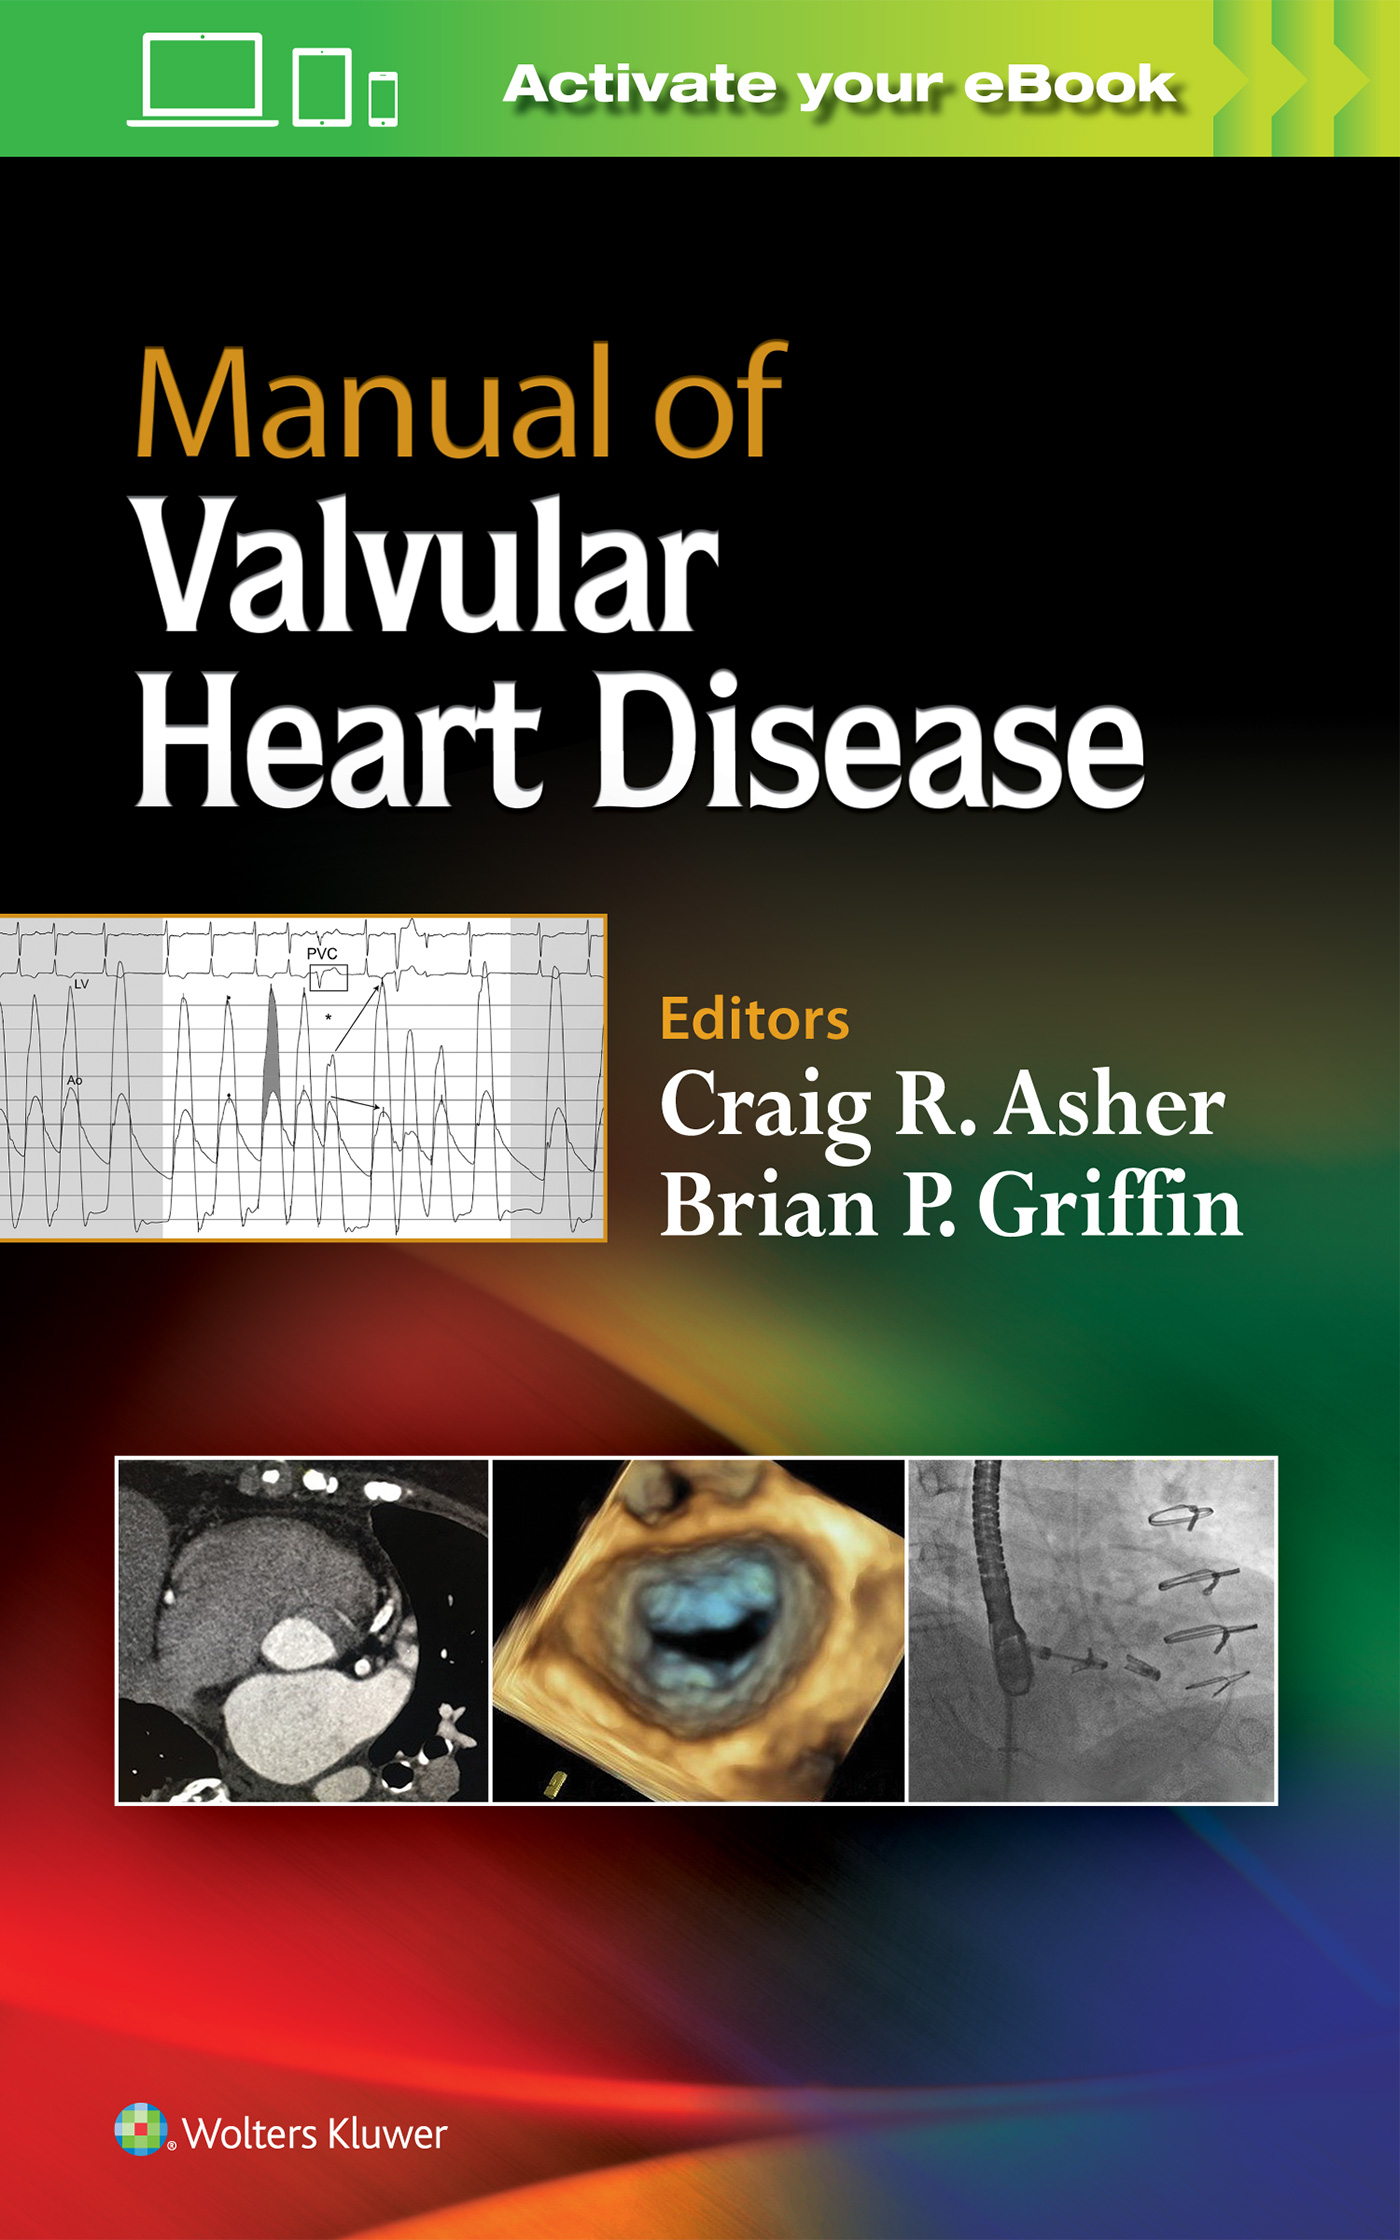 Guide to prosthetic cardiac valves ebook array manual of valvular heart disease rh shop lww com fandeluxe Gallery